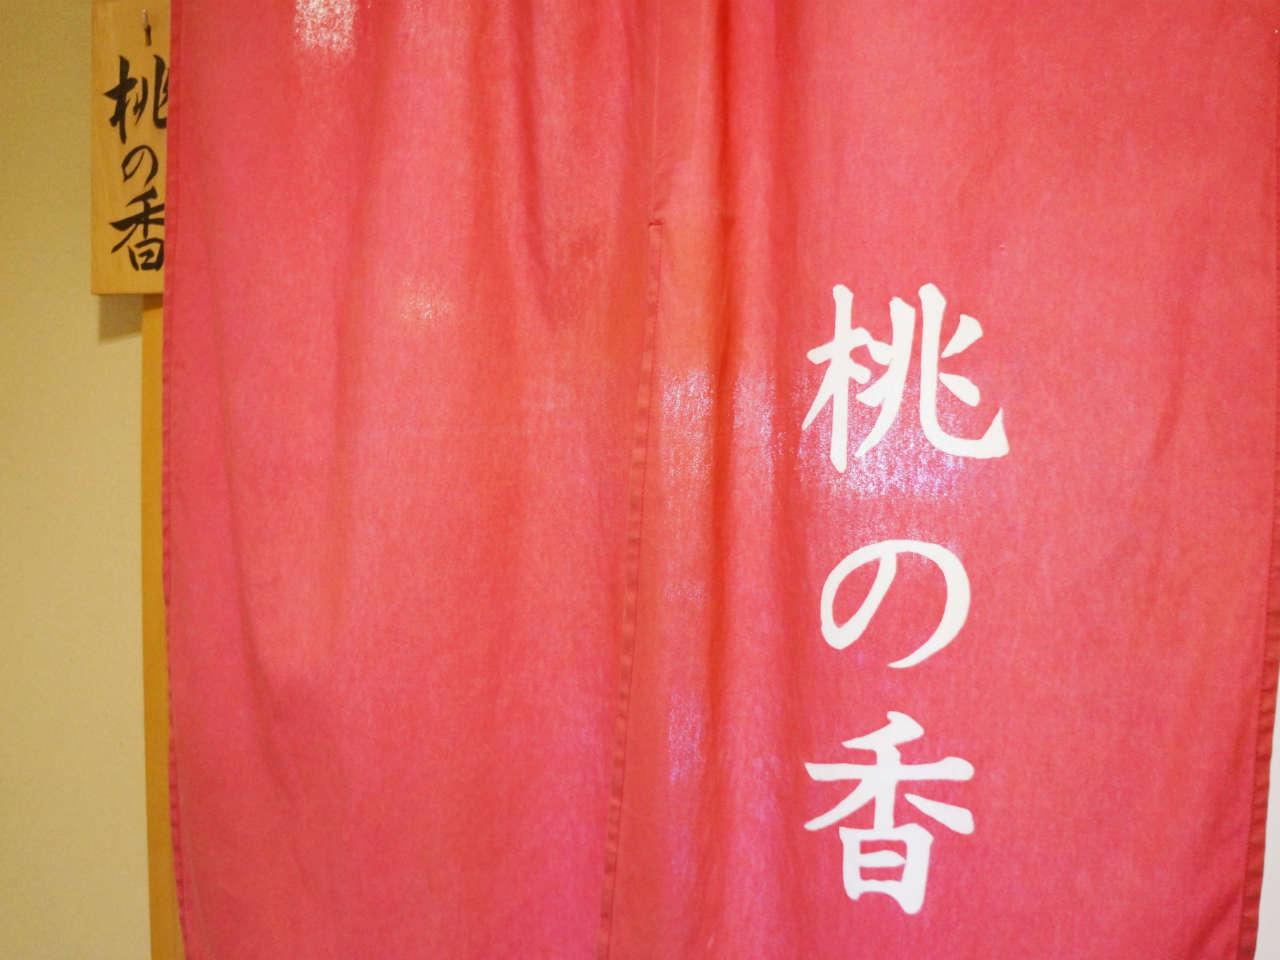 kamogawa-homeiden-f3